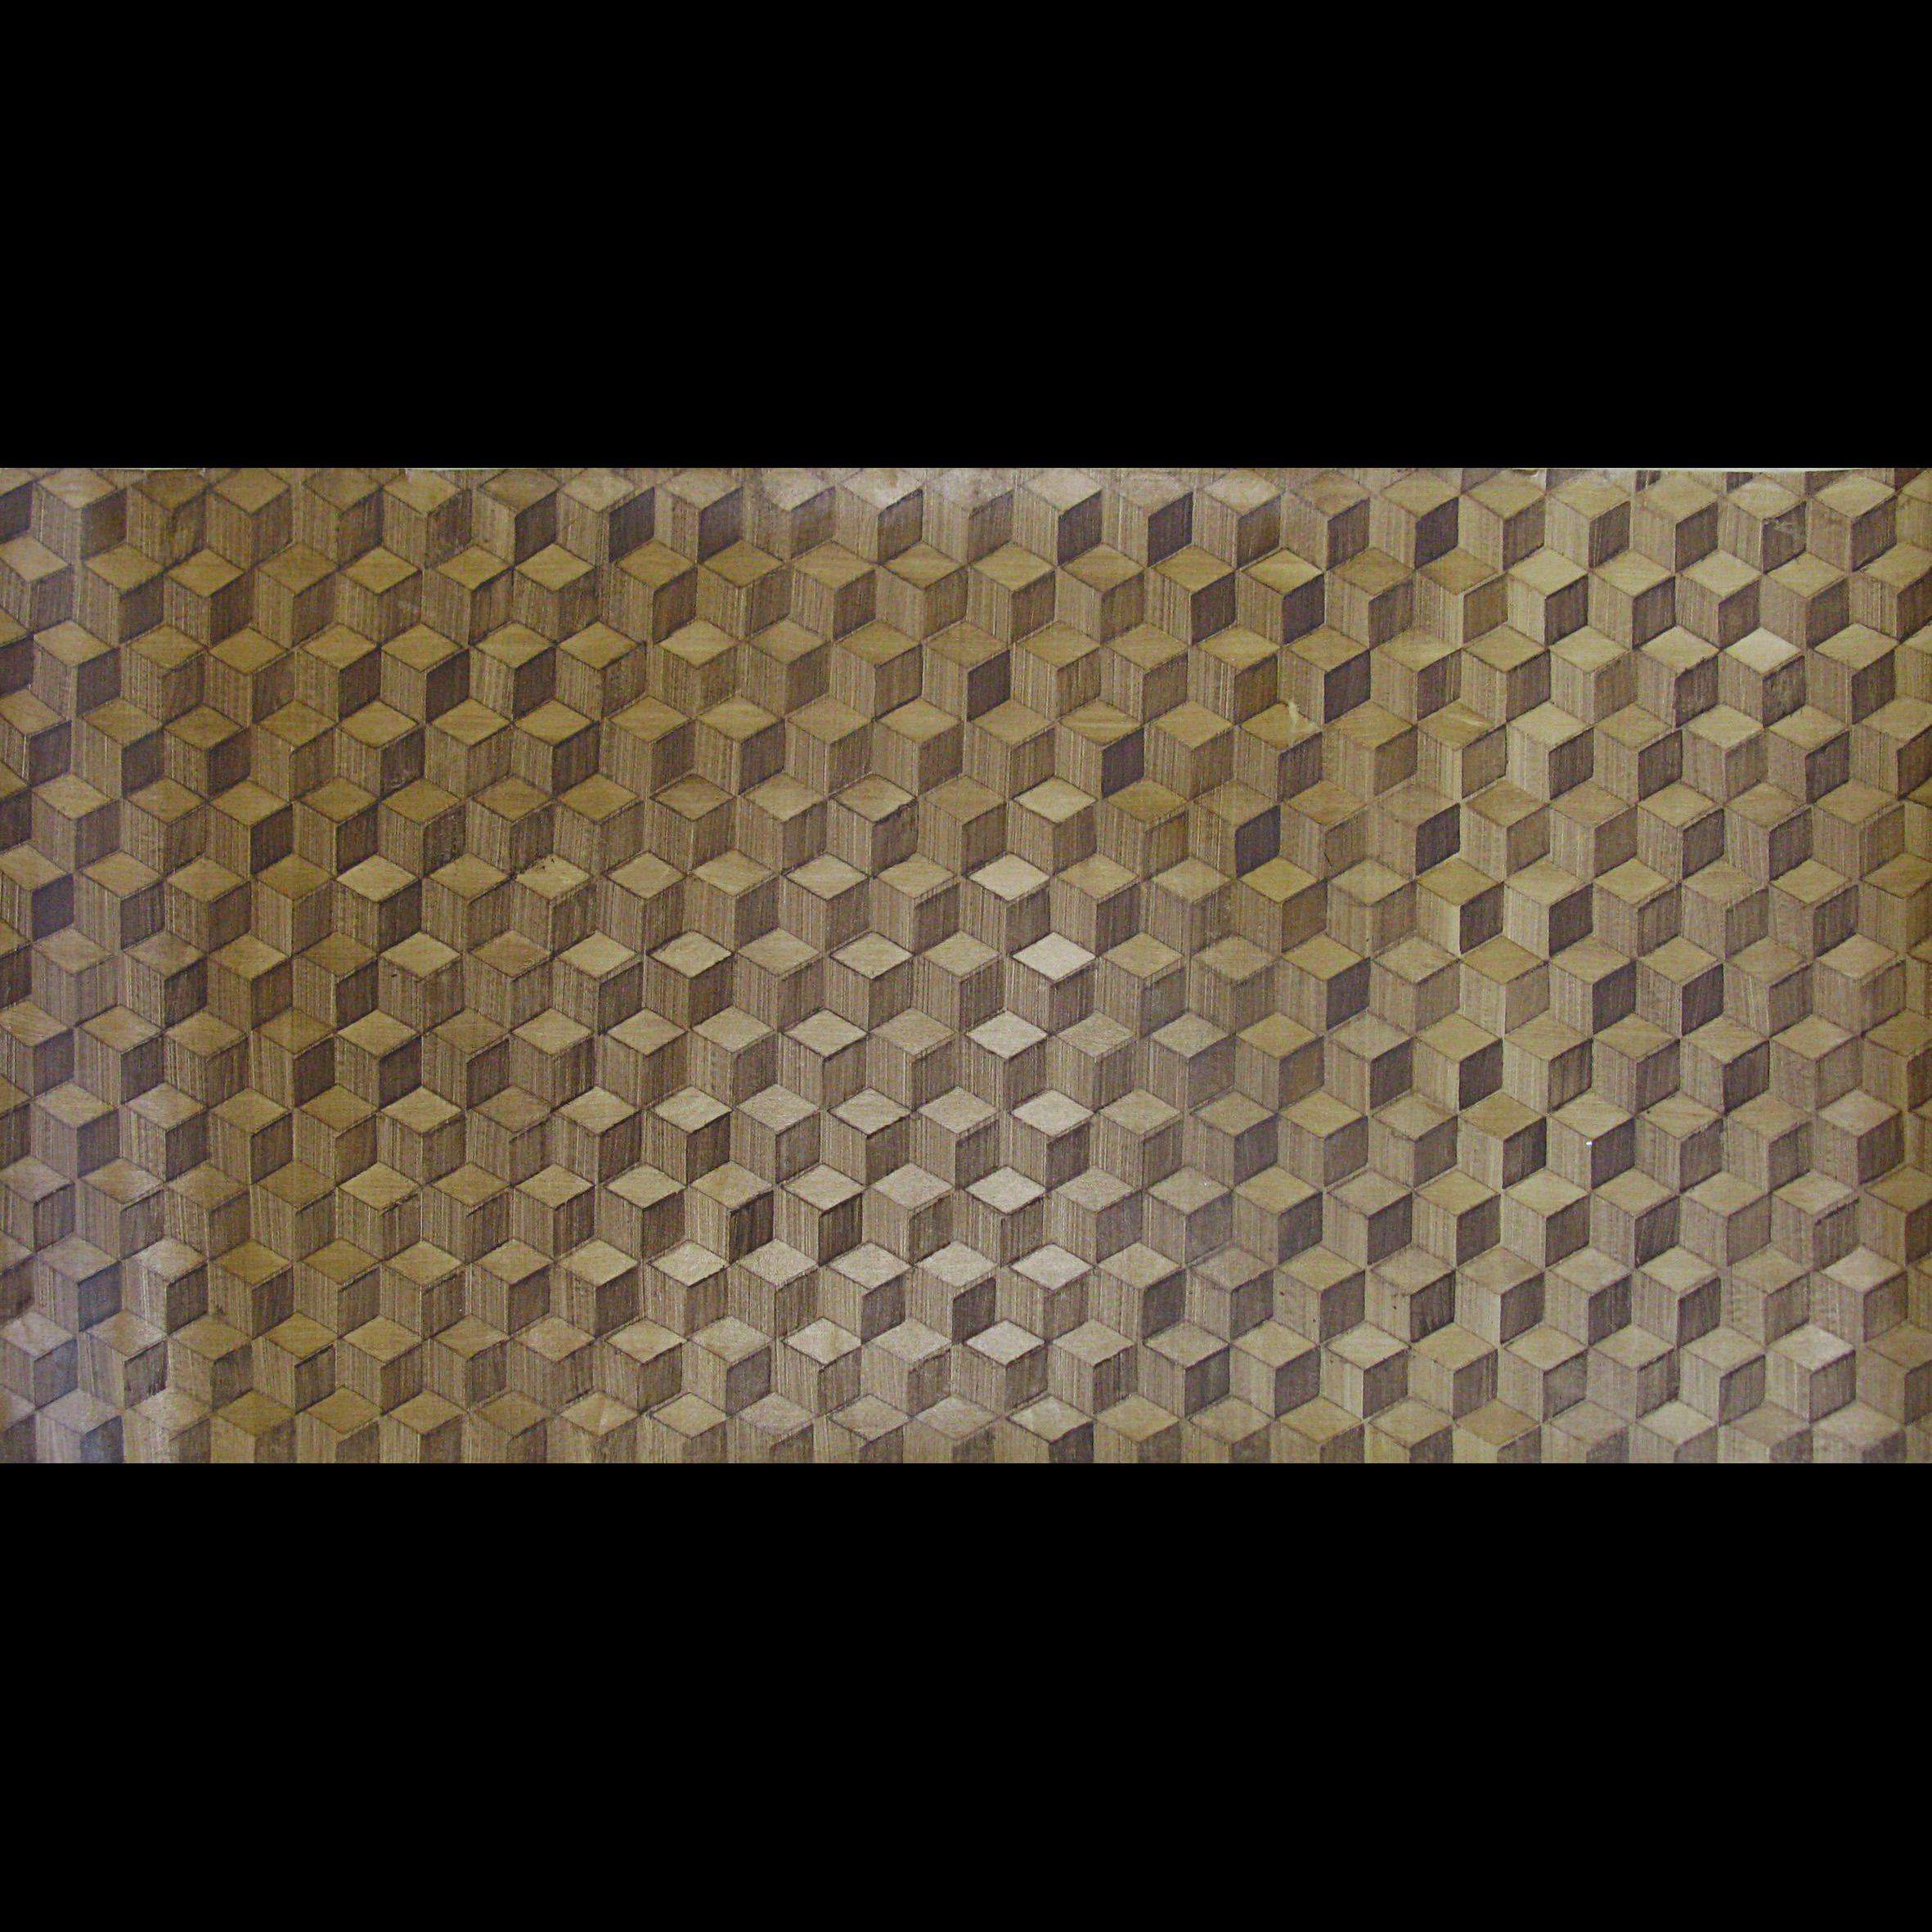 Woodgrained Wallpaper